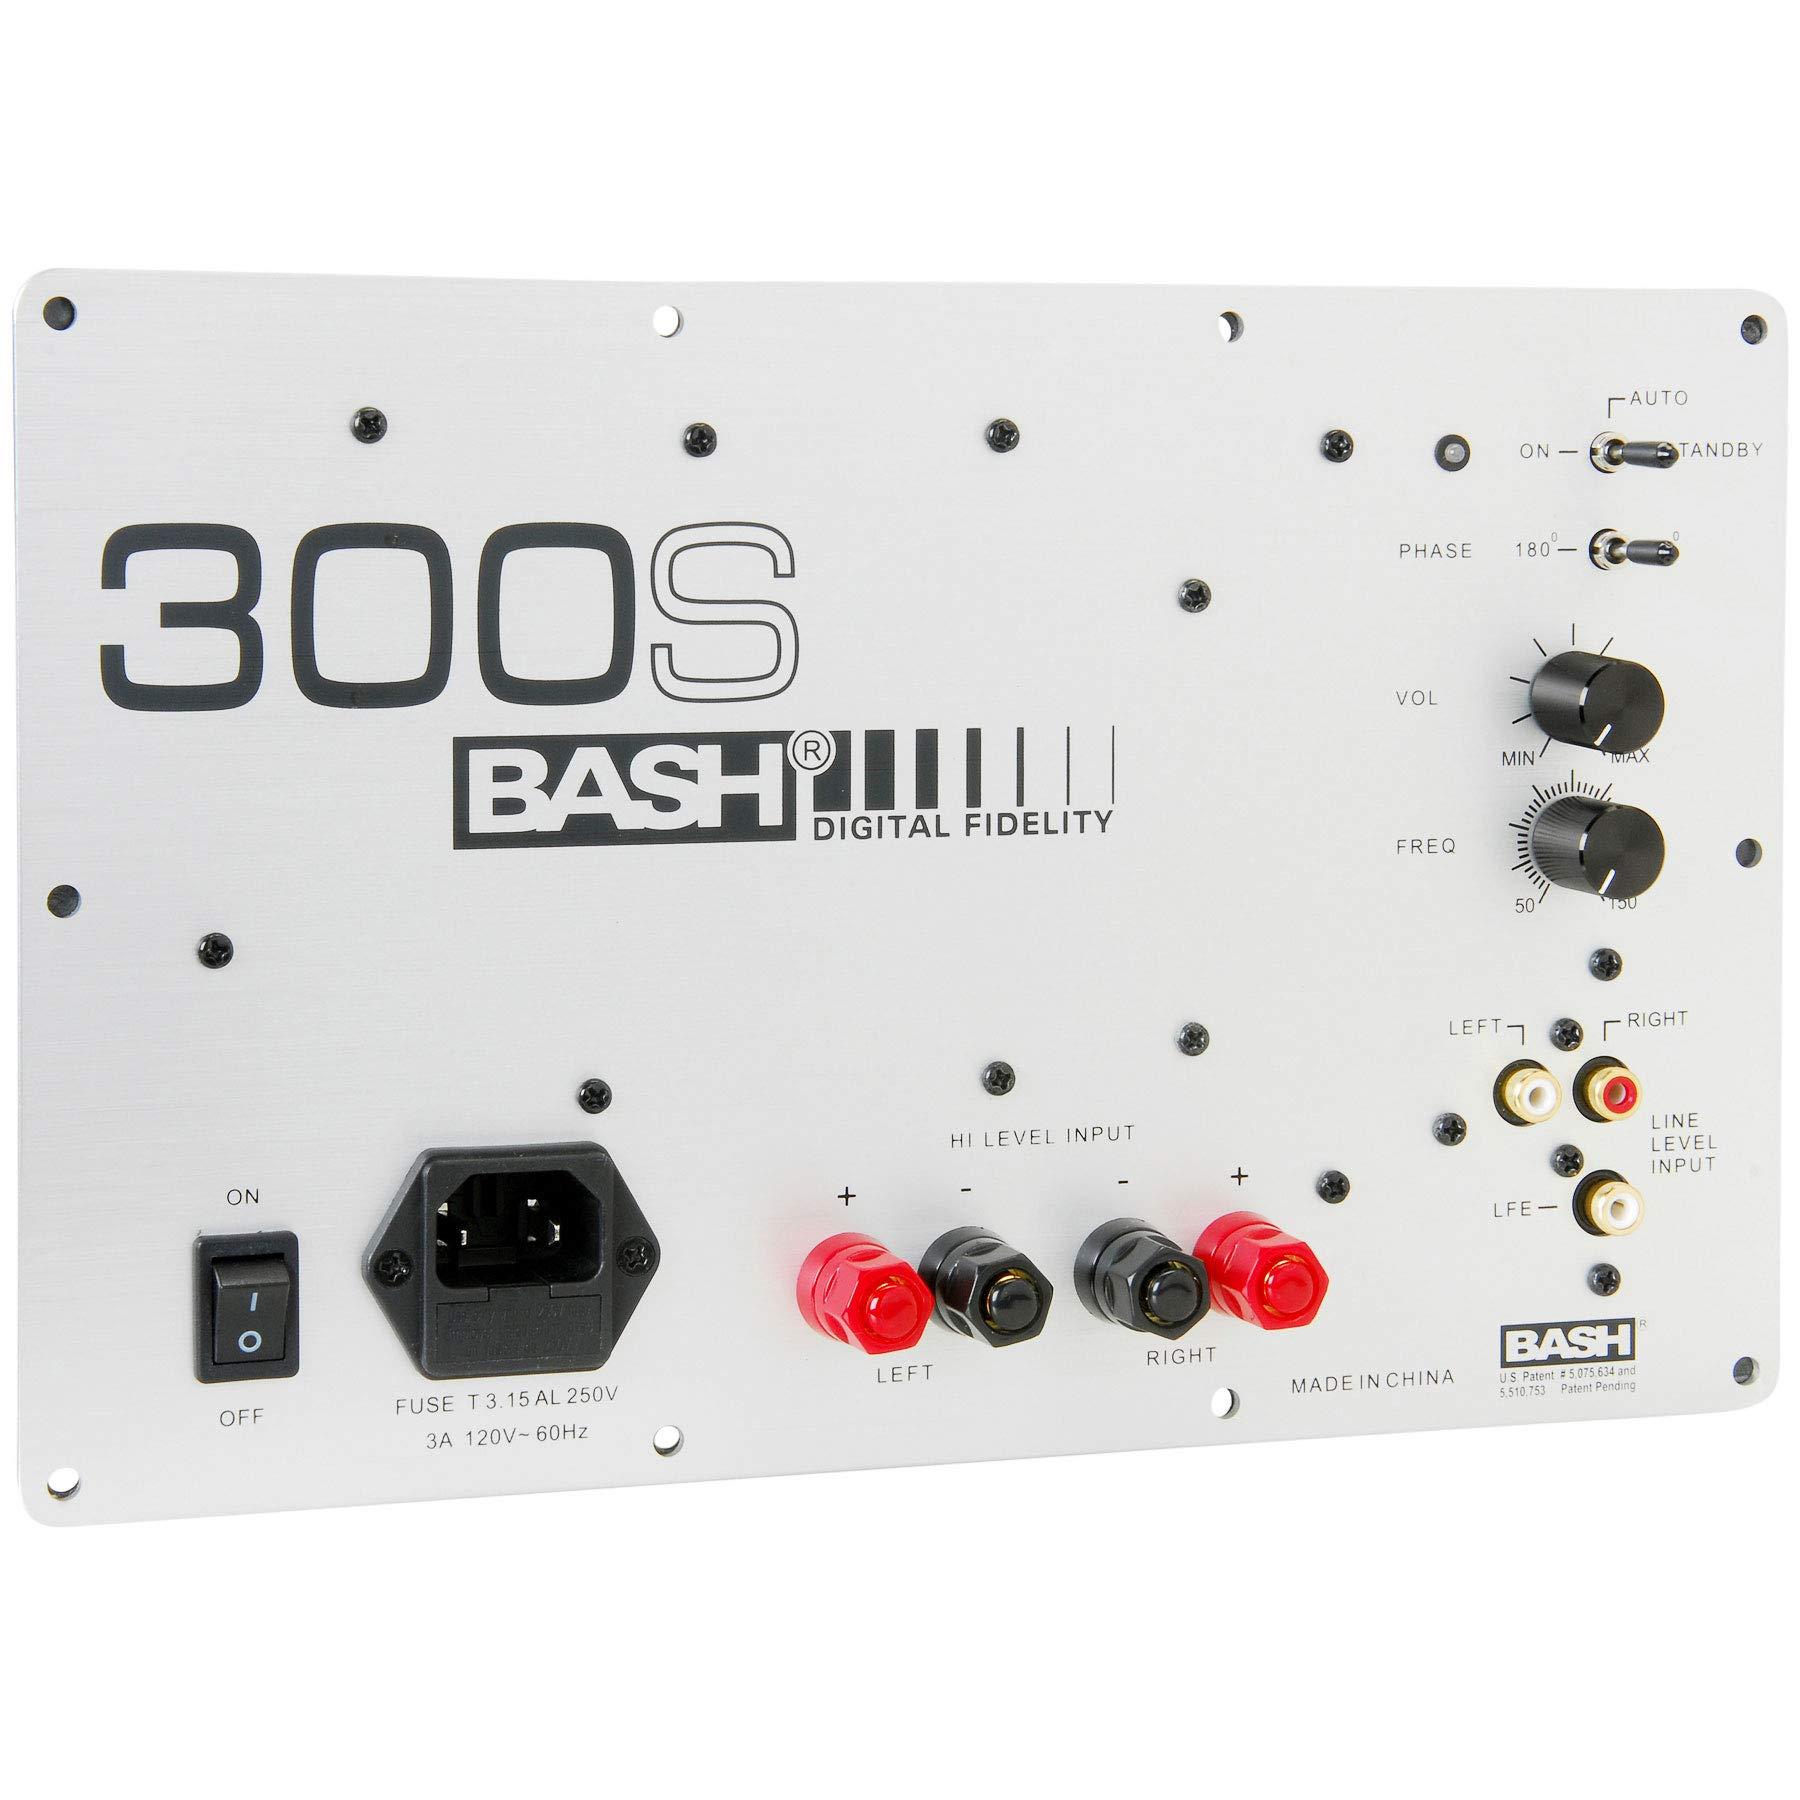 amazon com bash 300w digital subwoofer amplifier electronics